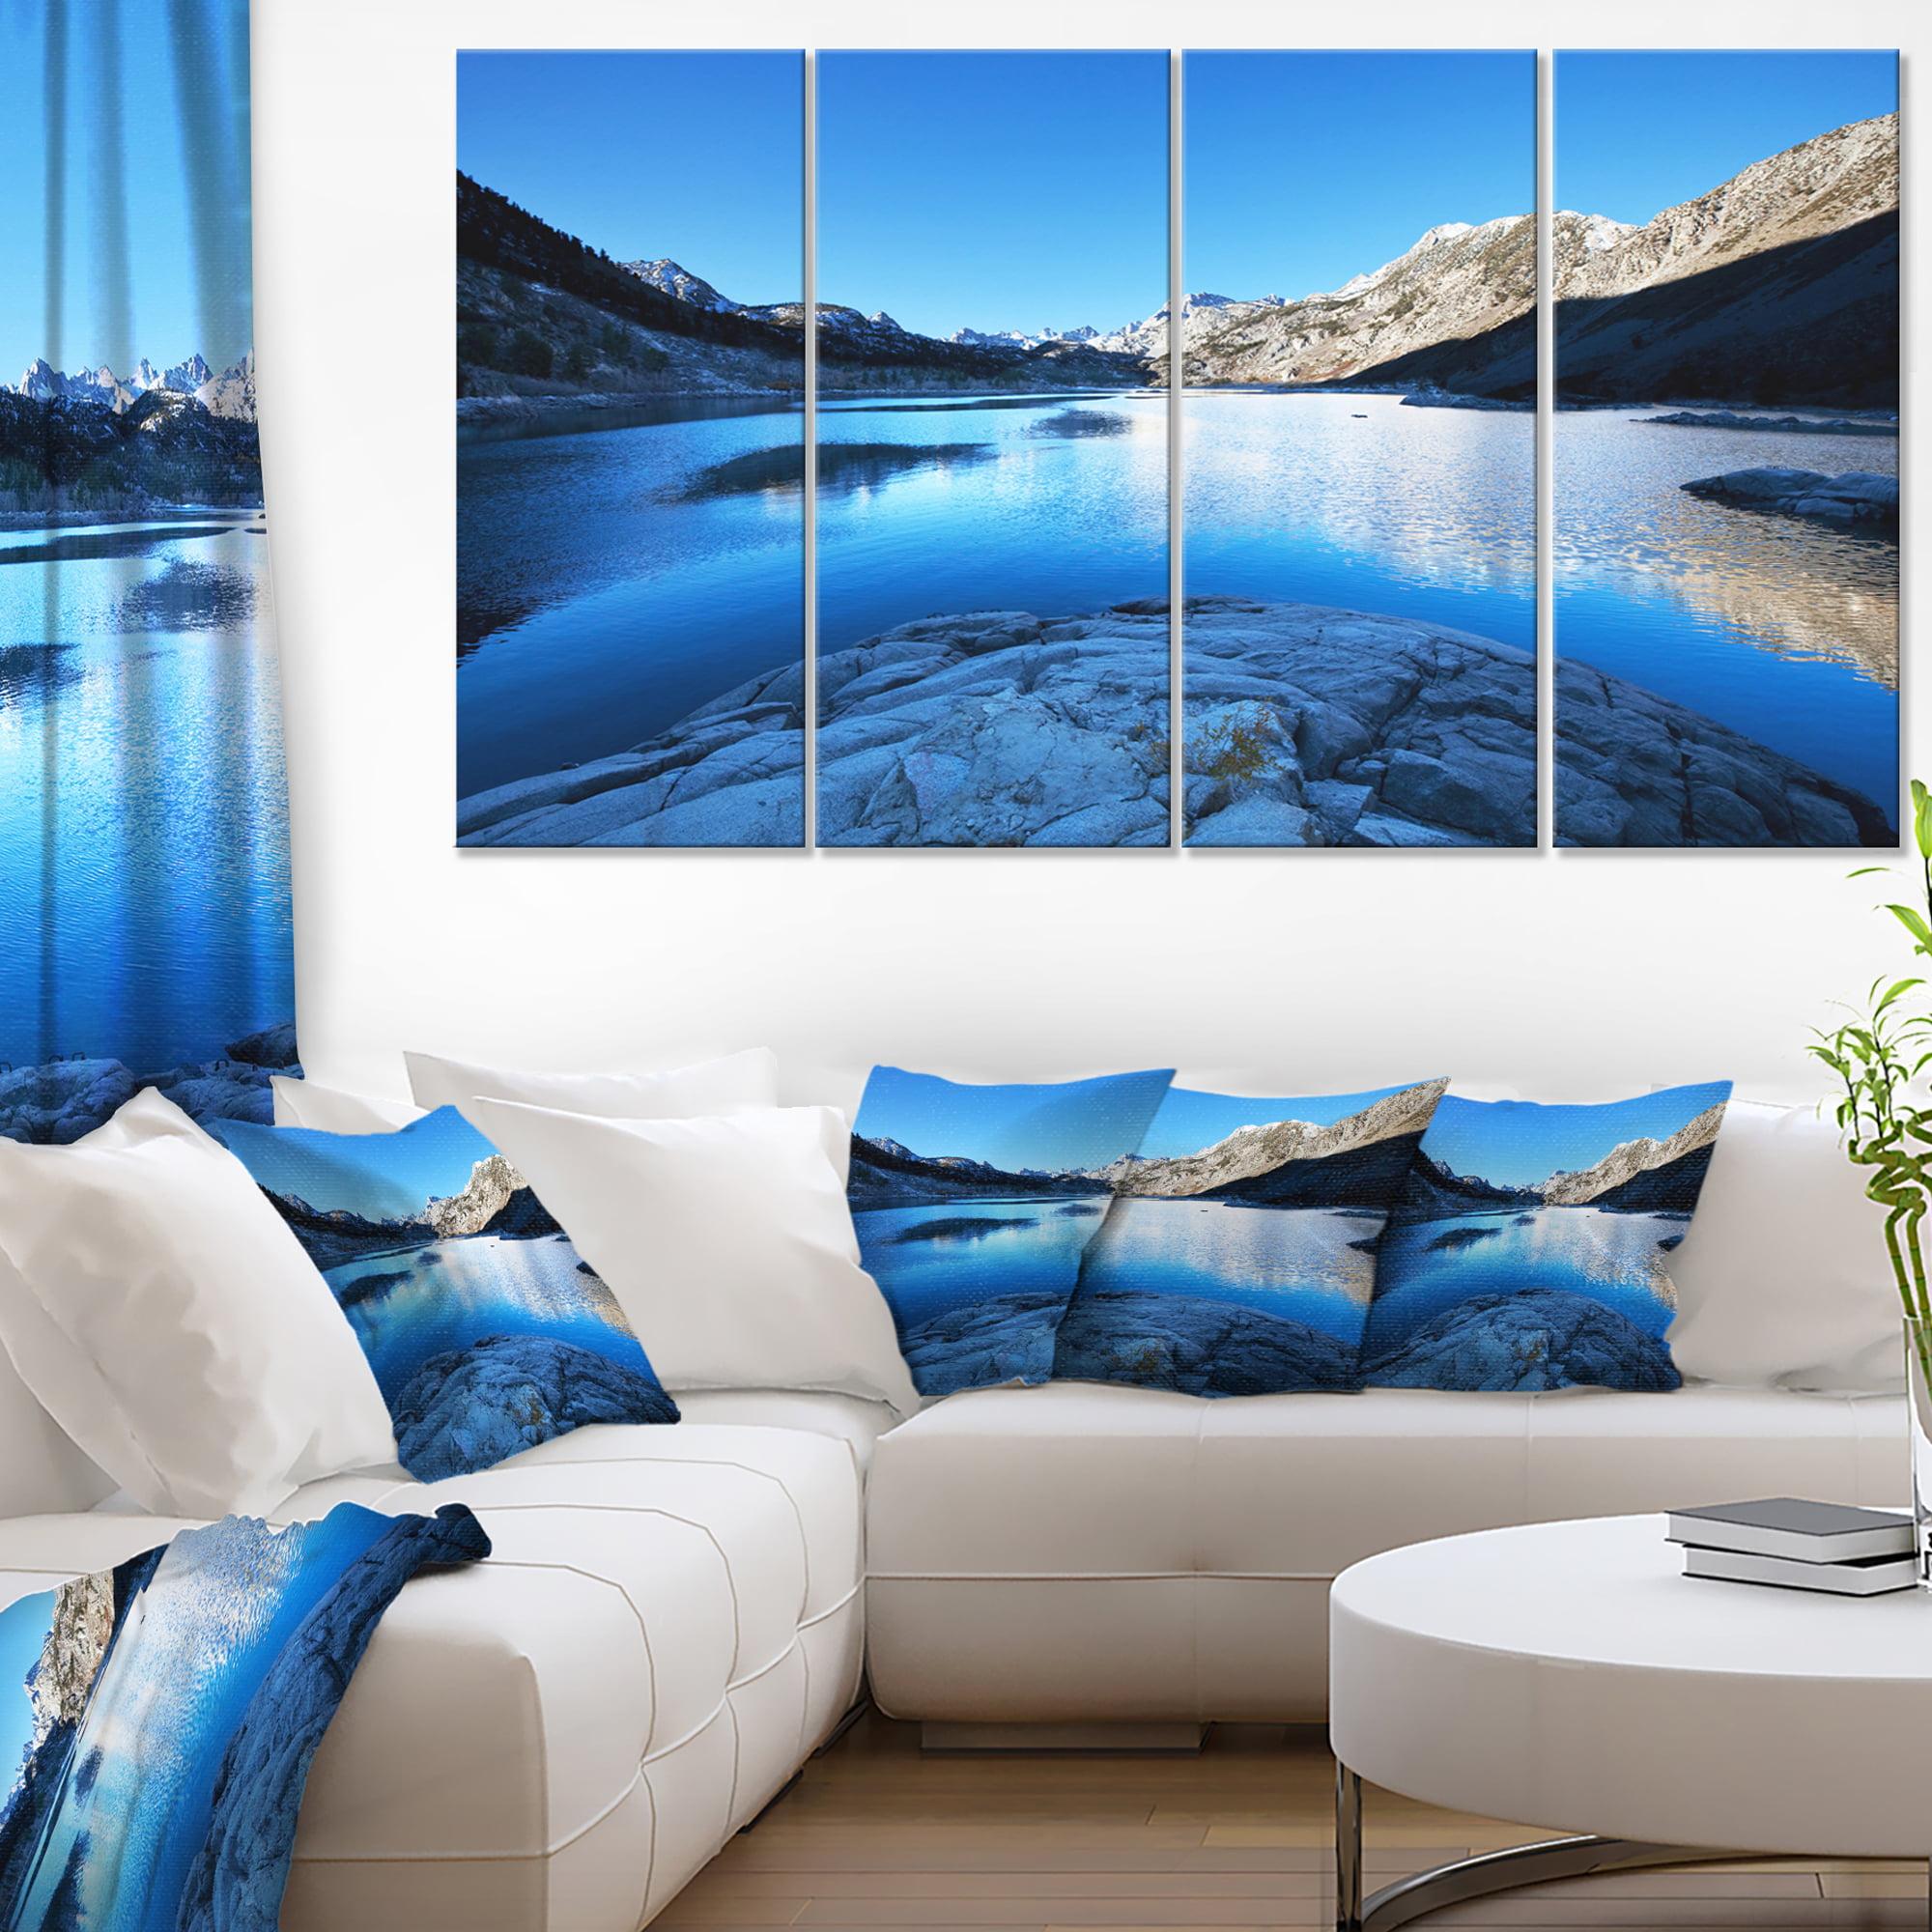 Amazing Blue Mountains Lake - Modern Landscape Canvas Art